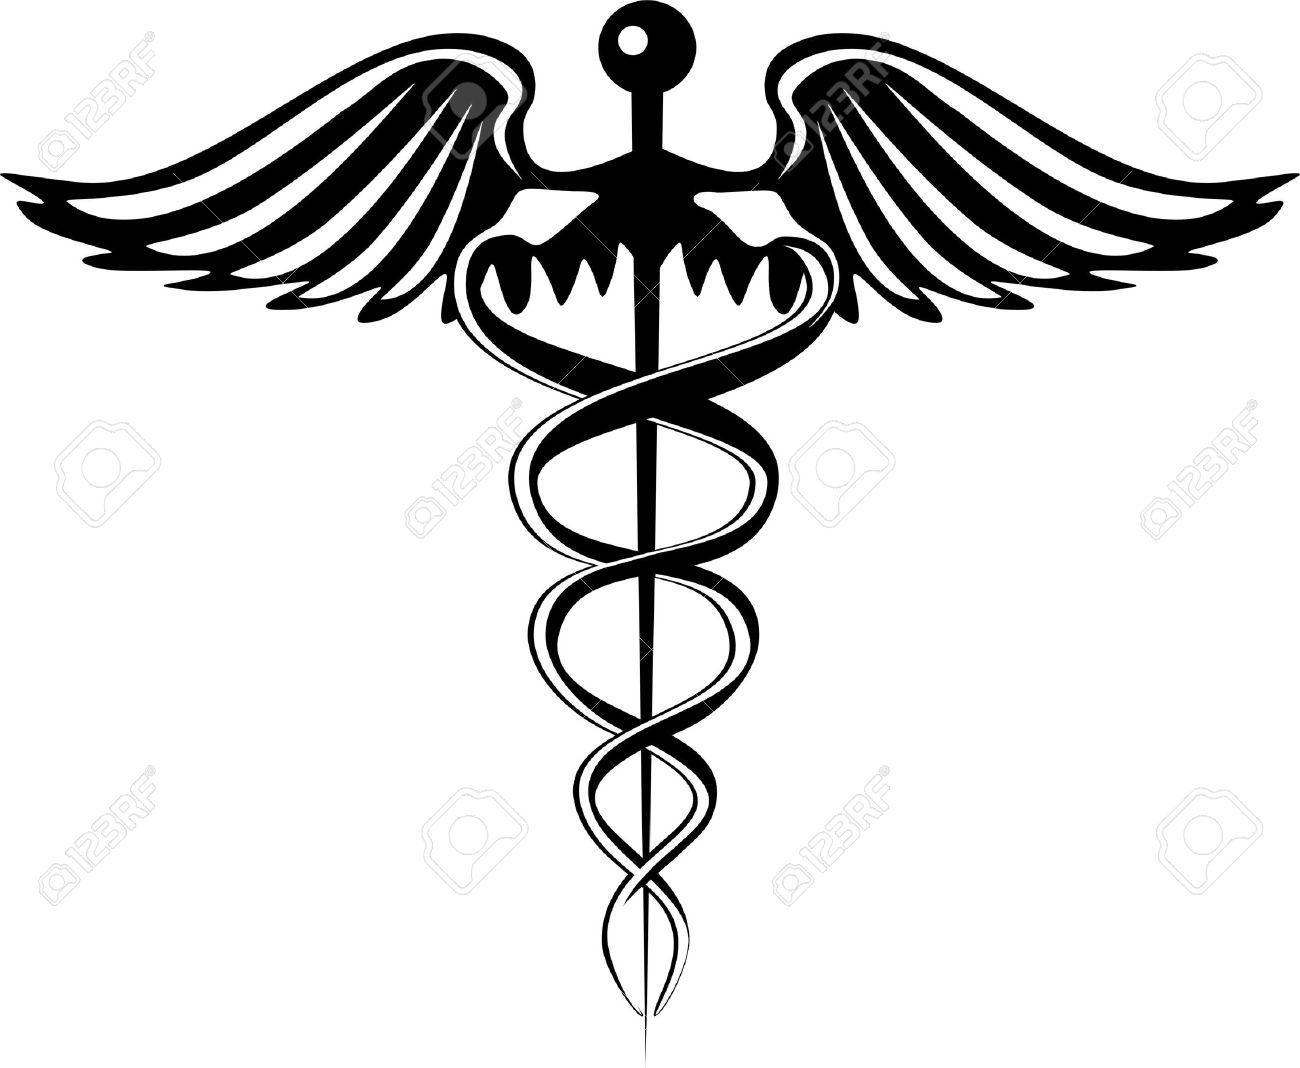 Caduceus Pharmacy Symbol Stock Vector - 17342496